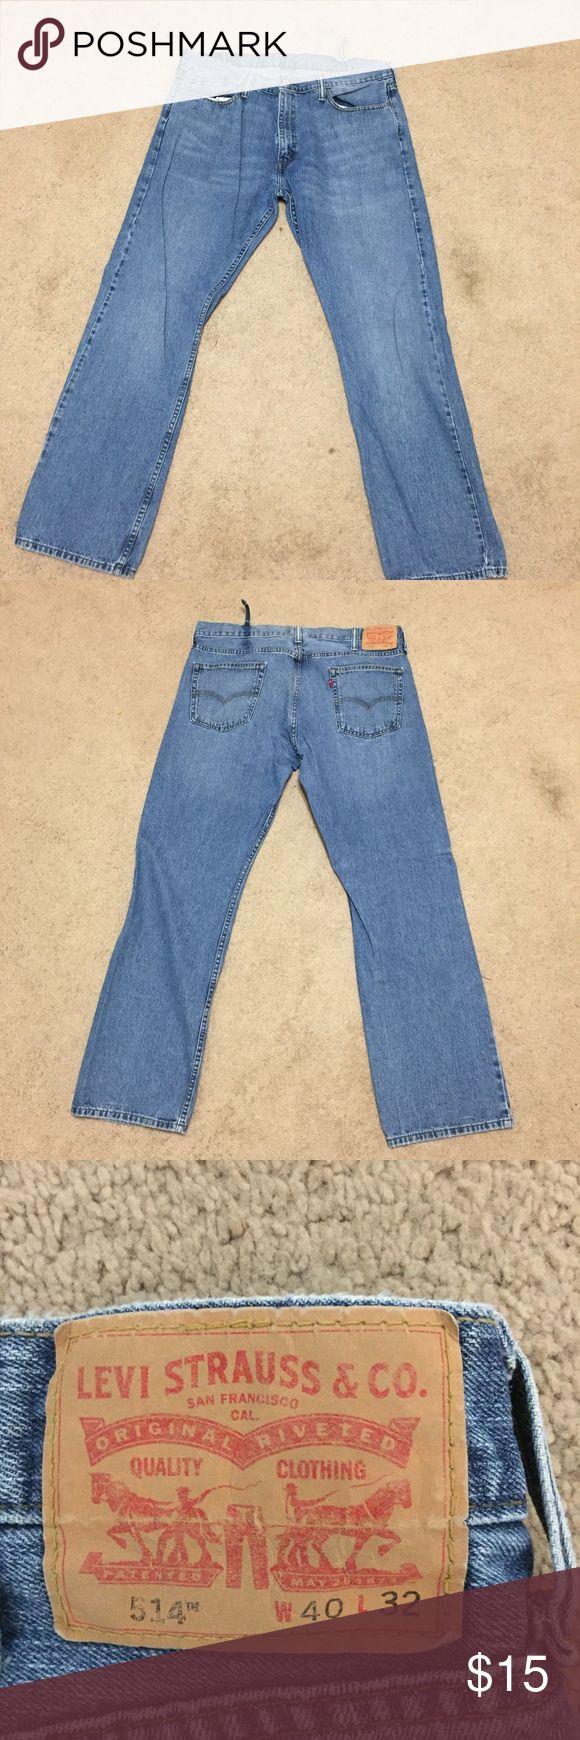 Men's Levi Jeans Men's Levi jeans. One torn belt loop. Smoke free home. Size 40x32 Jeans Bootcut